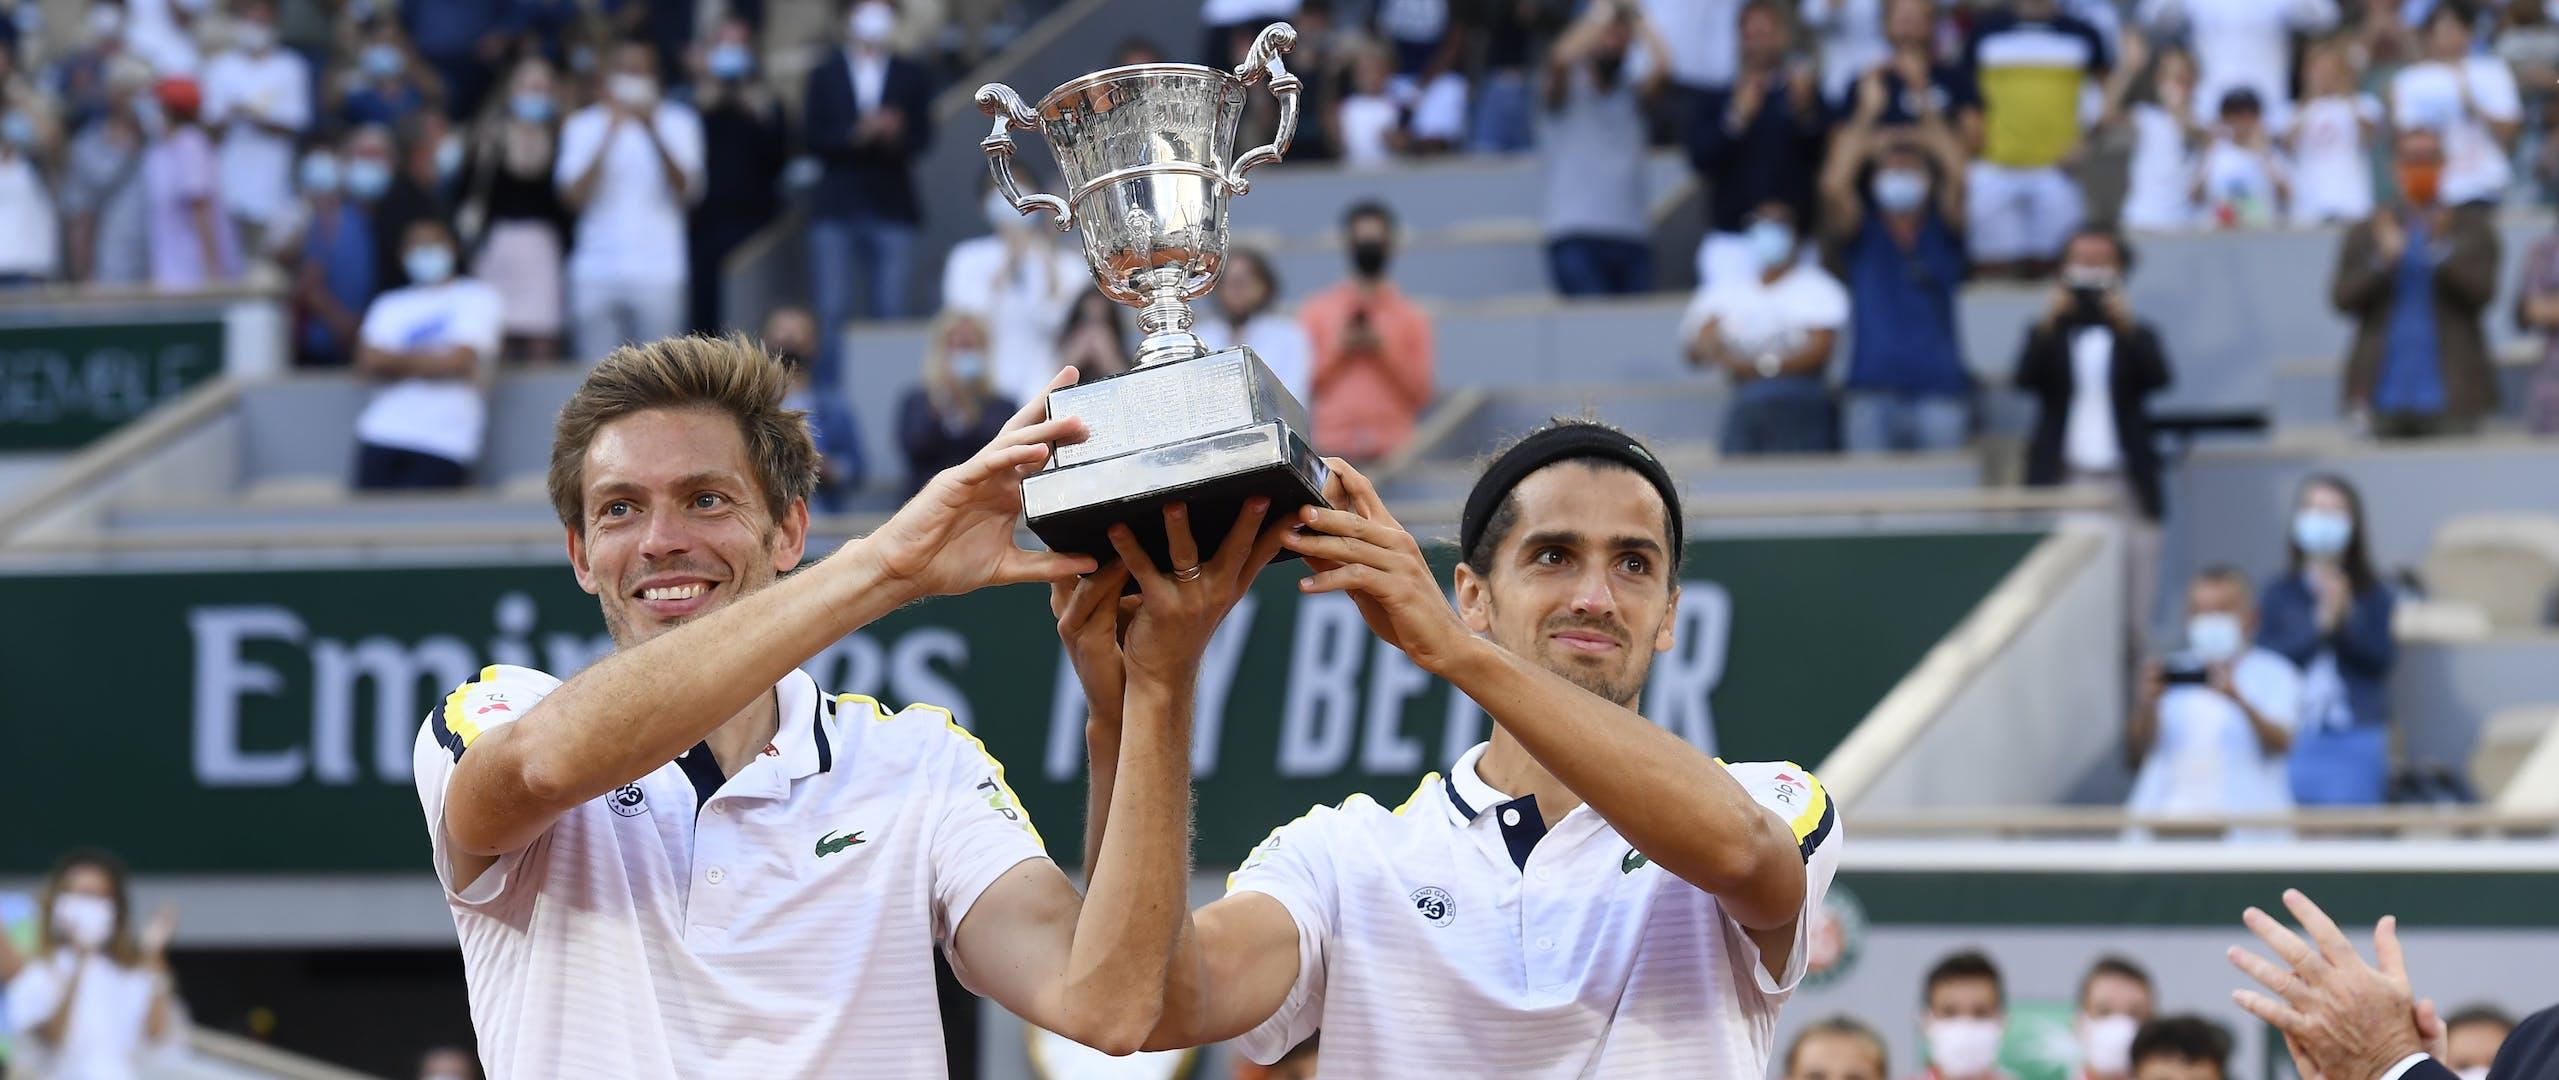 Pierre-Hugues Herbert, Nicolas Mahut, Roland Garros 2021, doubles final